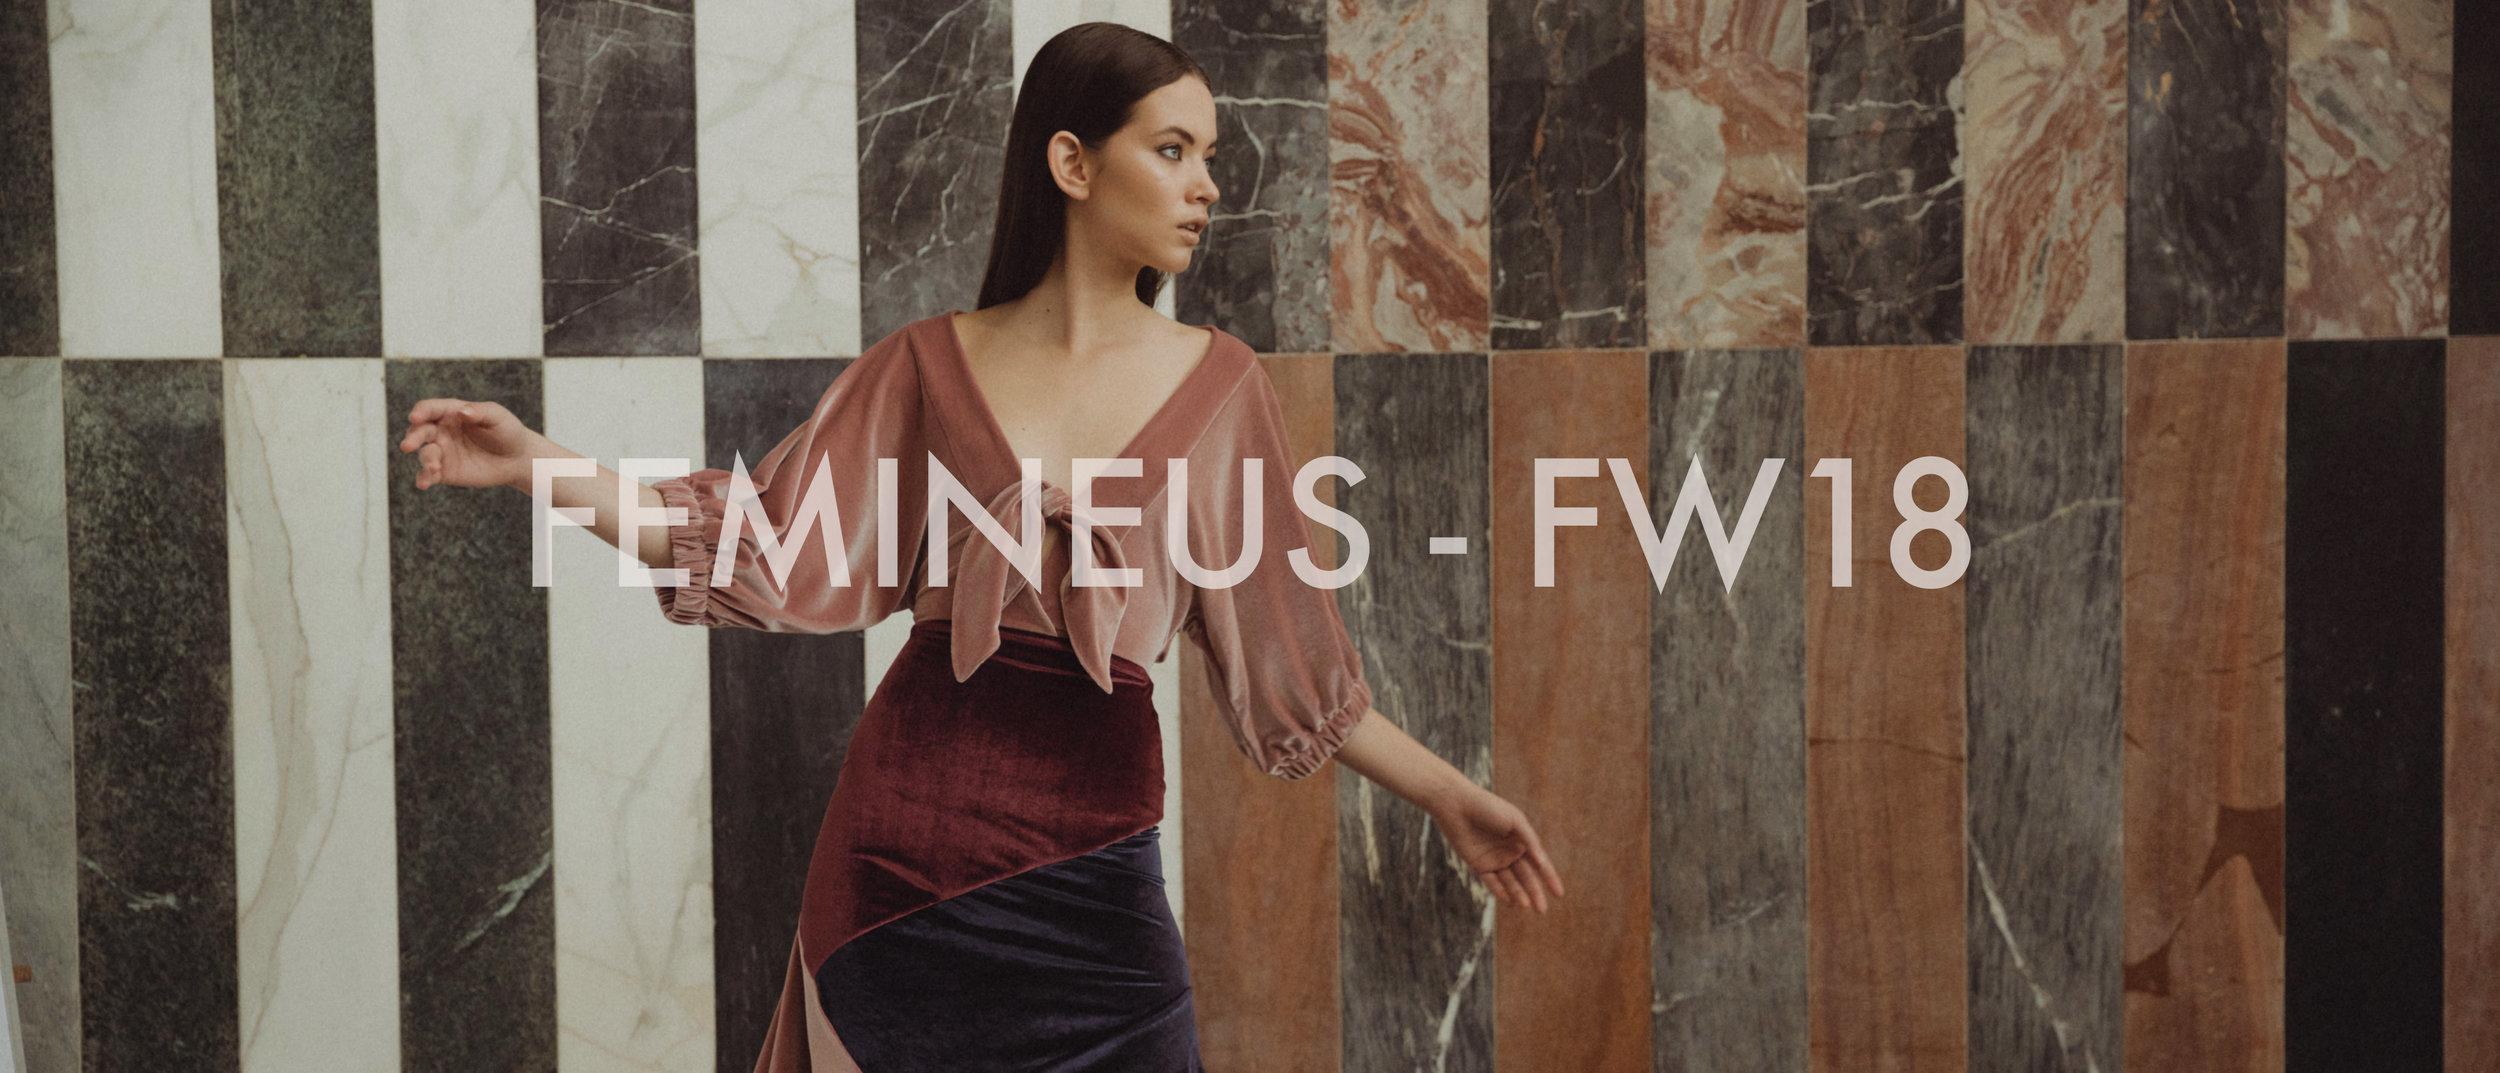 efrain_mogollon_femineus%22america%22 dress_1.jpg